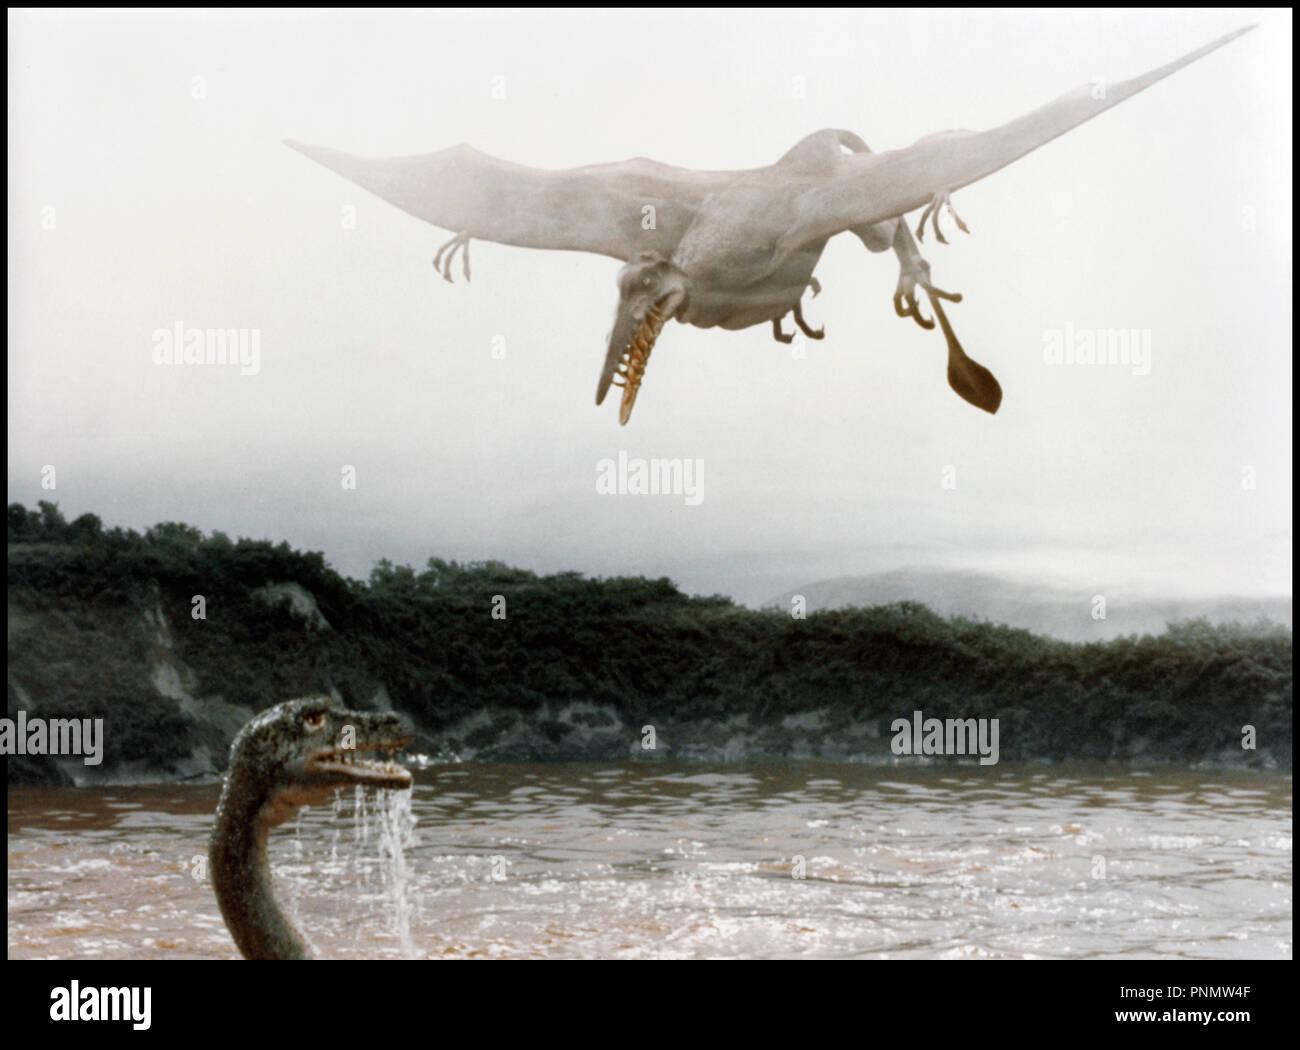 legend of dinosaurs & monster birds